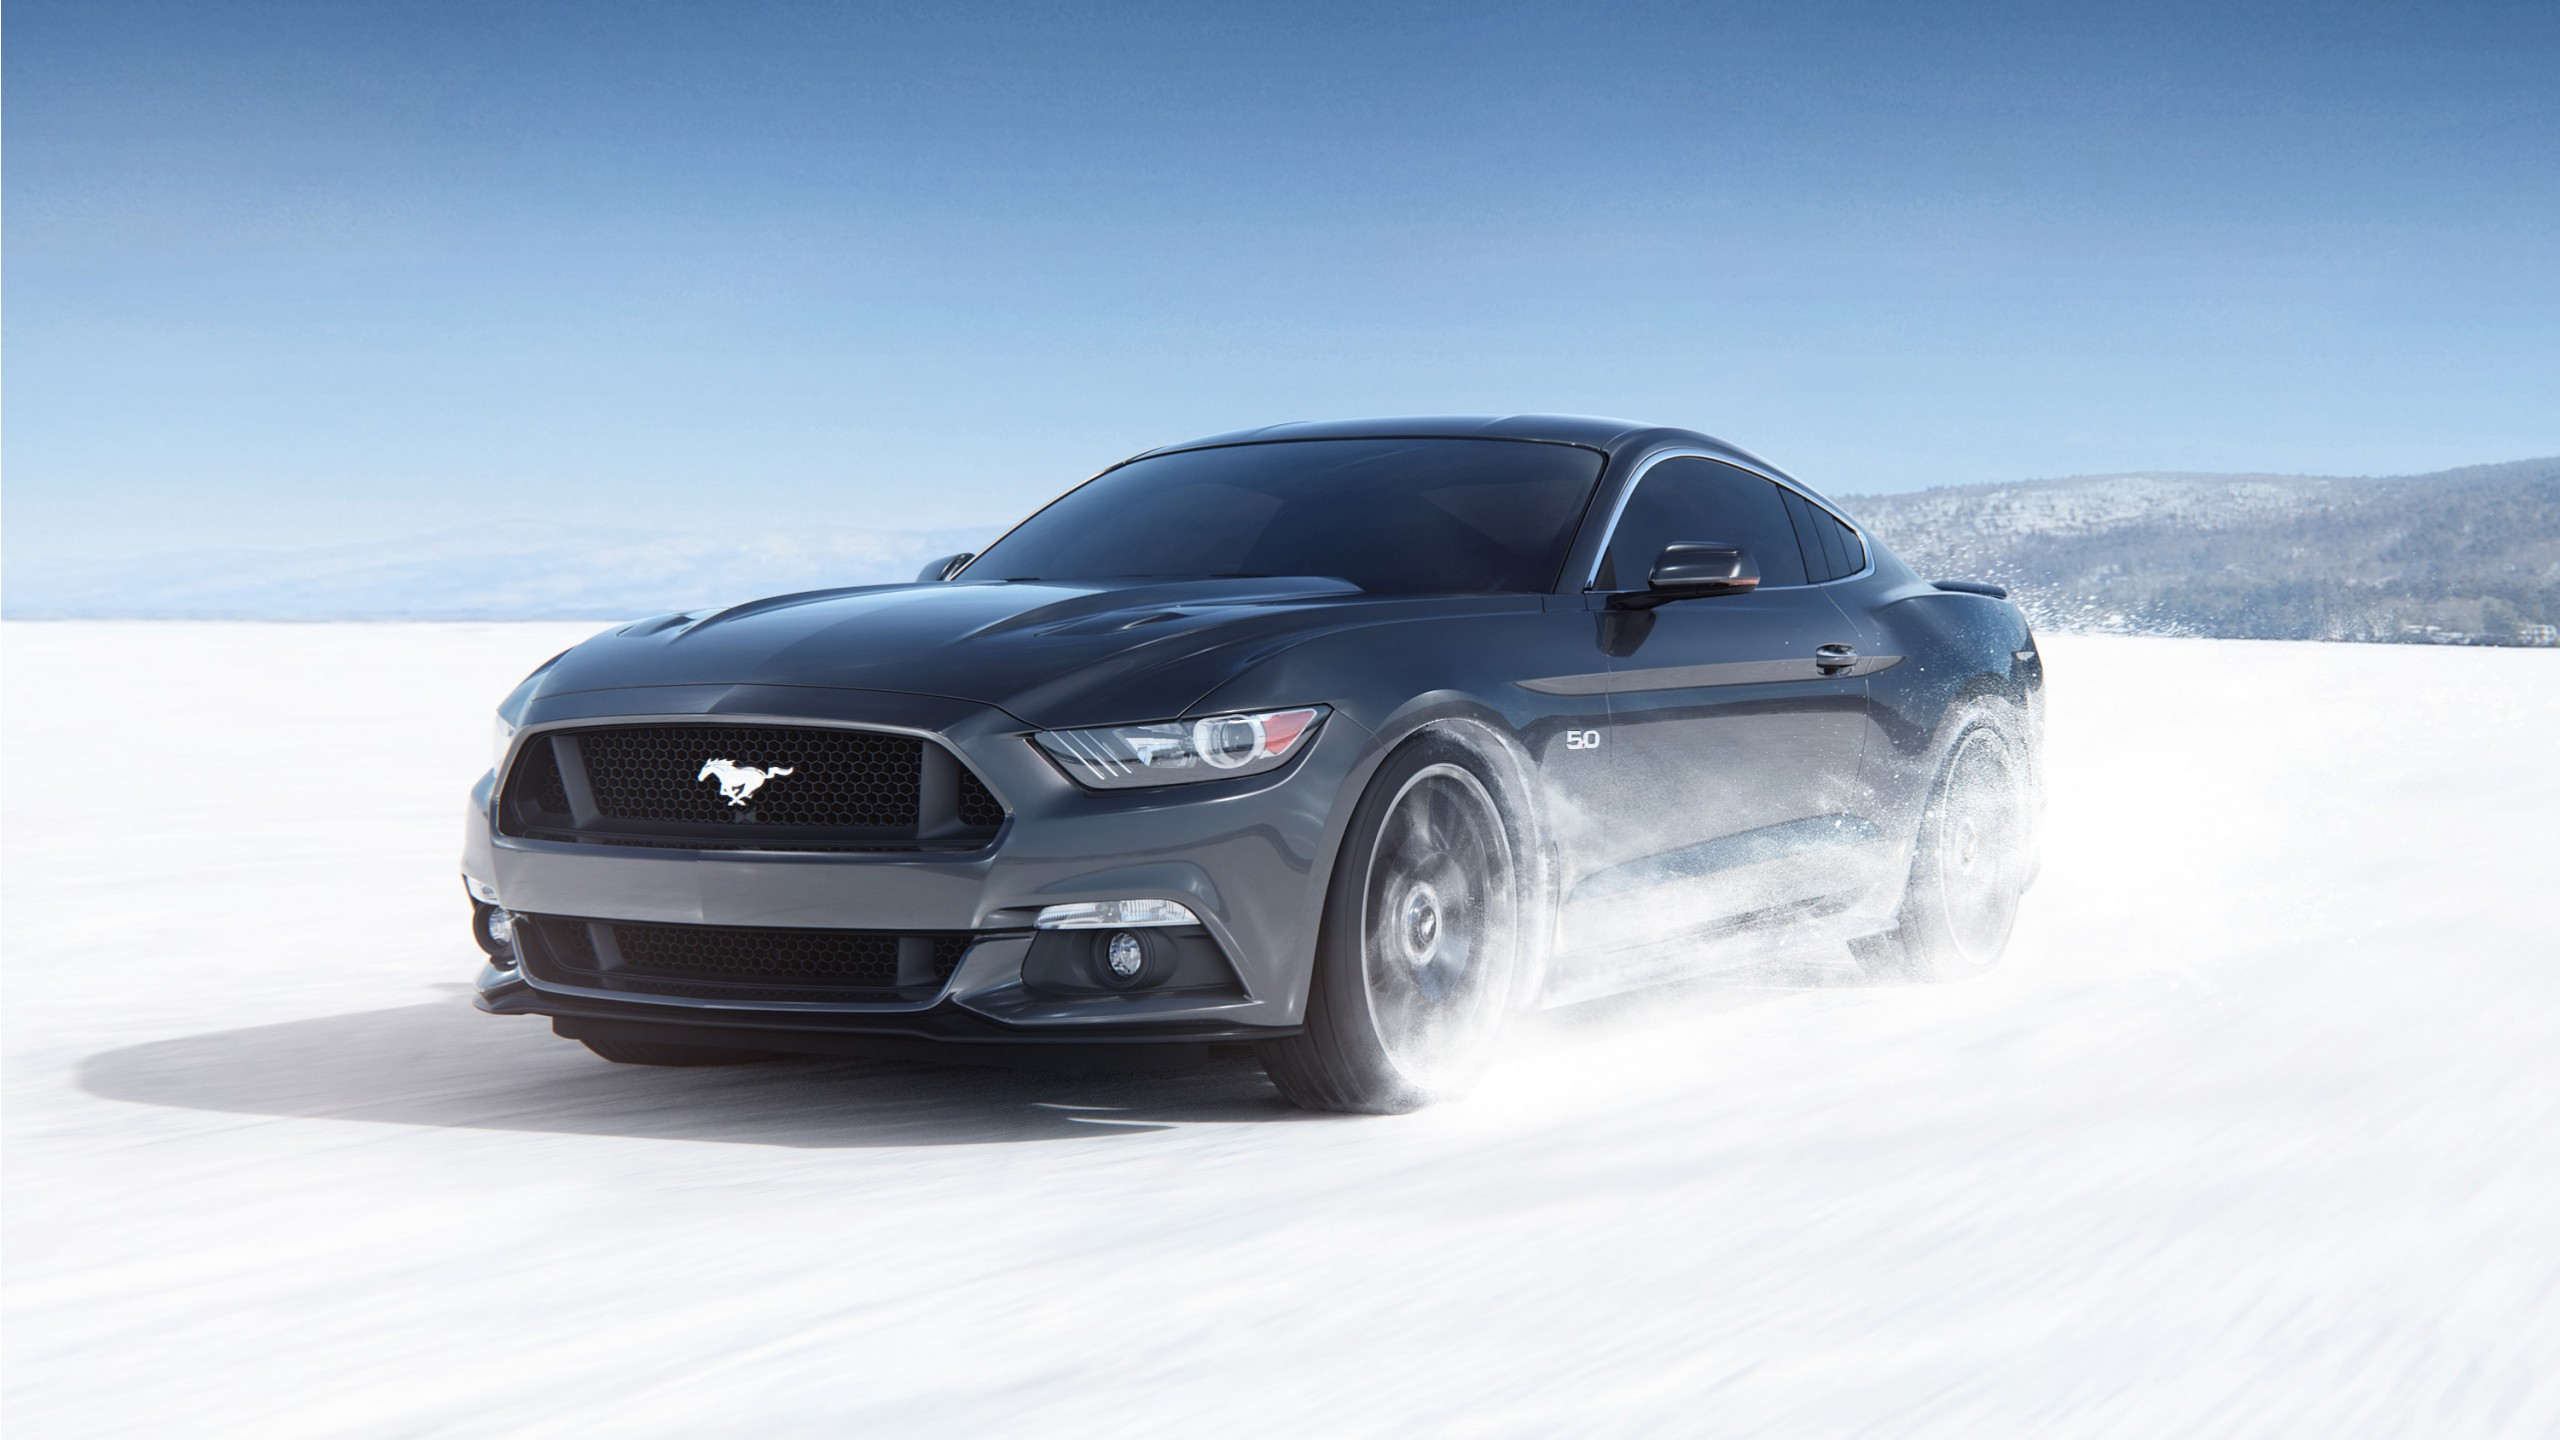 Ford Mustang 2018 4k Wallpaper Hd Car Wallpapers Id 9089